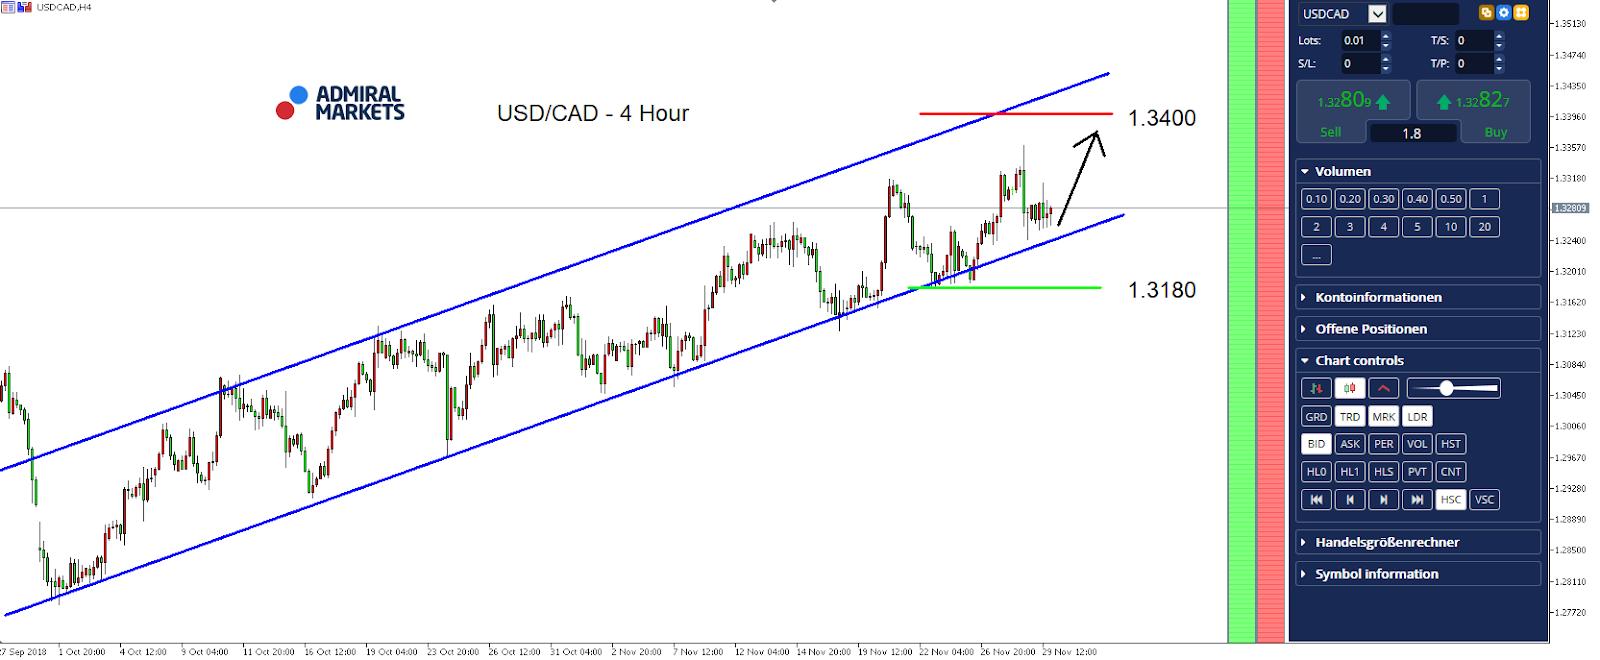 USD/CAD Hourly Chart - MetaTrader 5 Supreme Edition